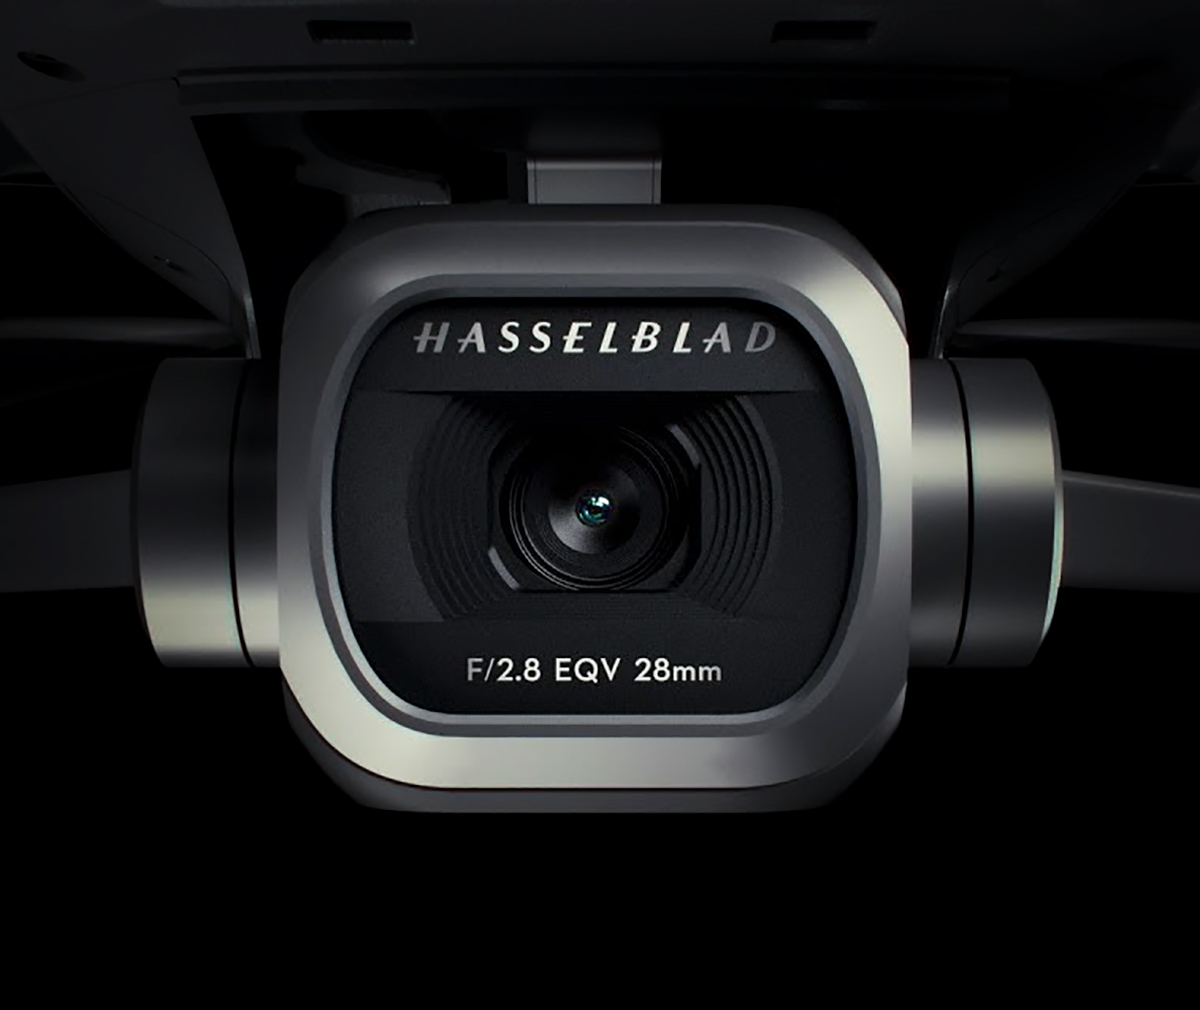 Camara hasselblad del dron Mavic 2 Pro